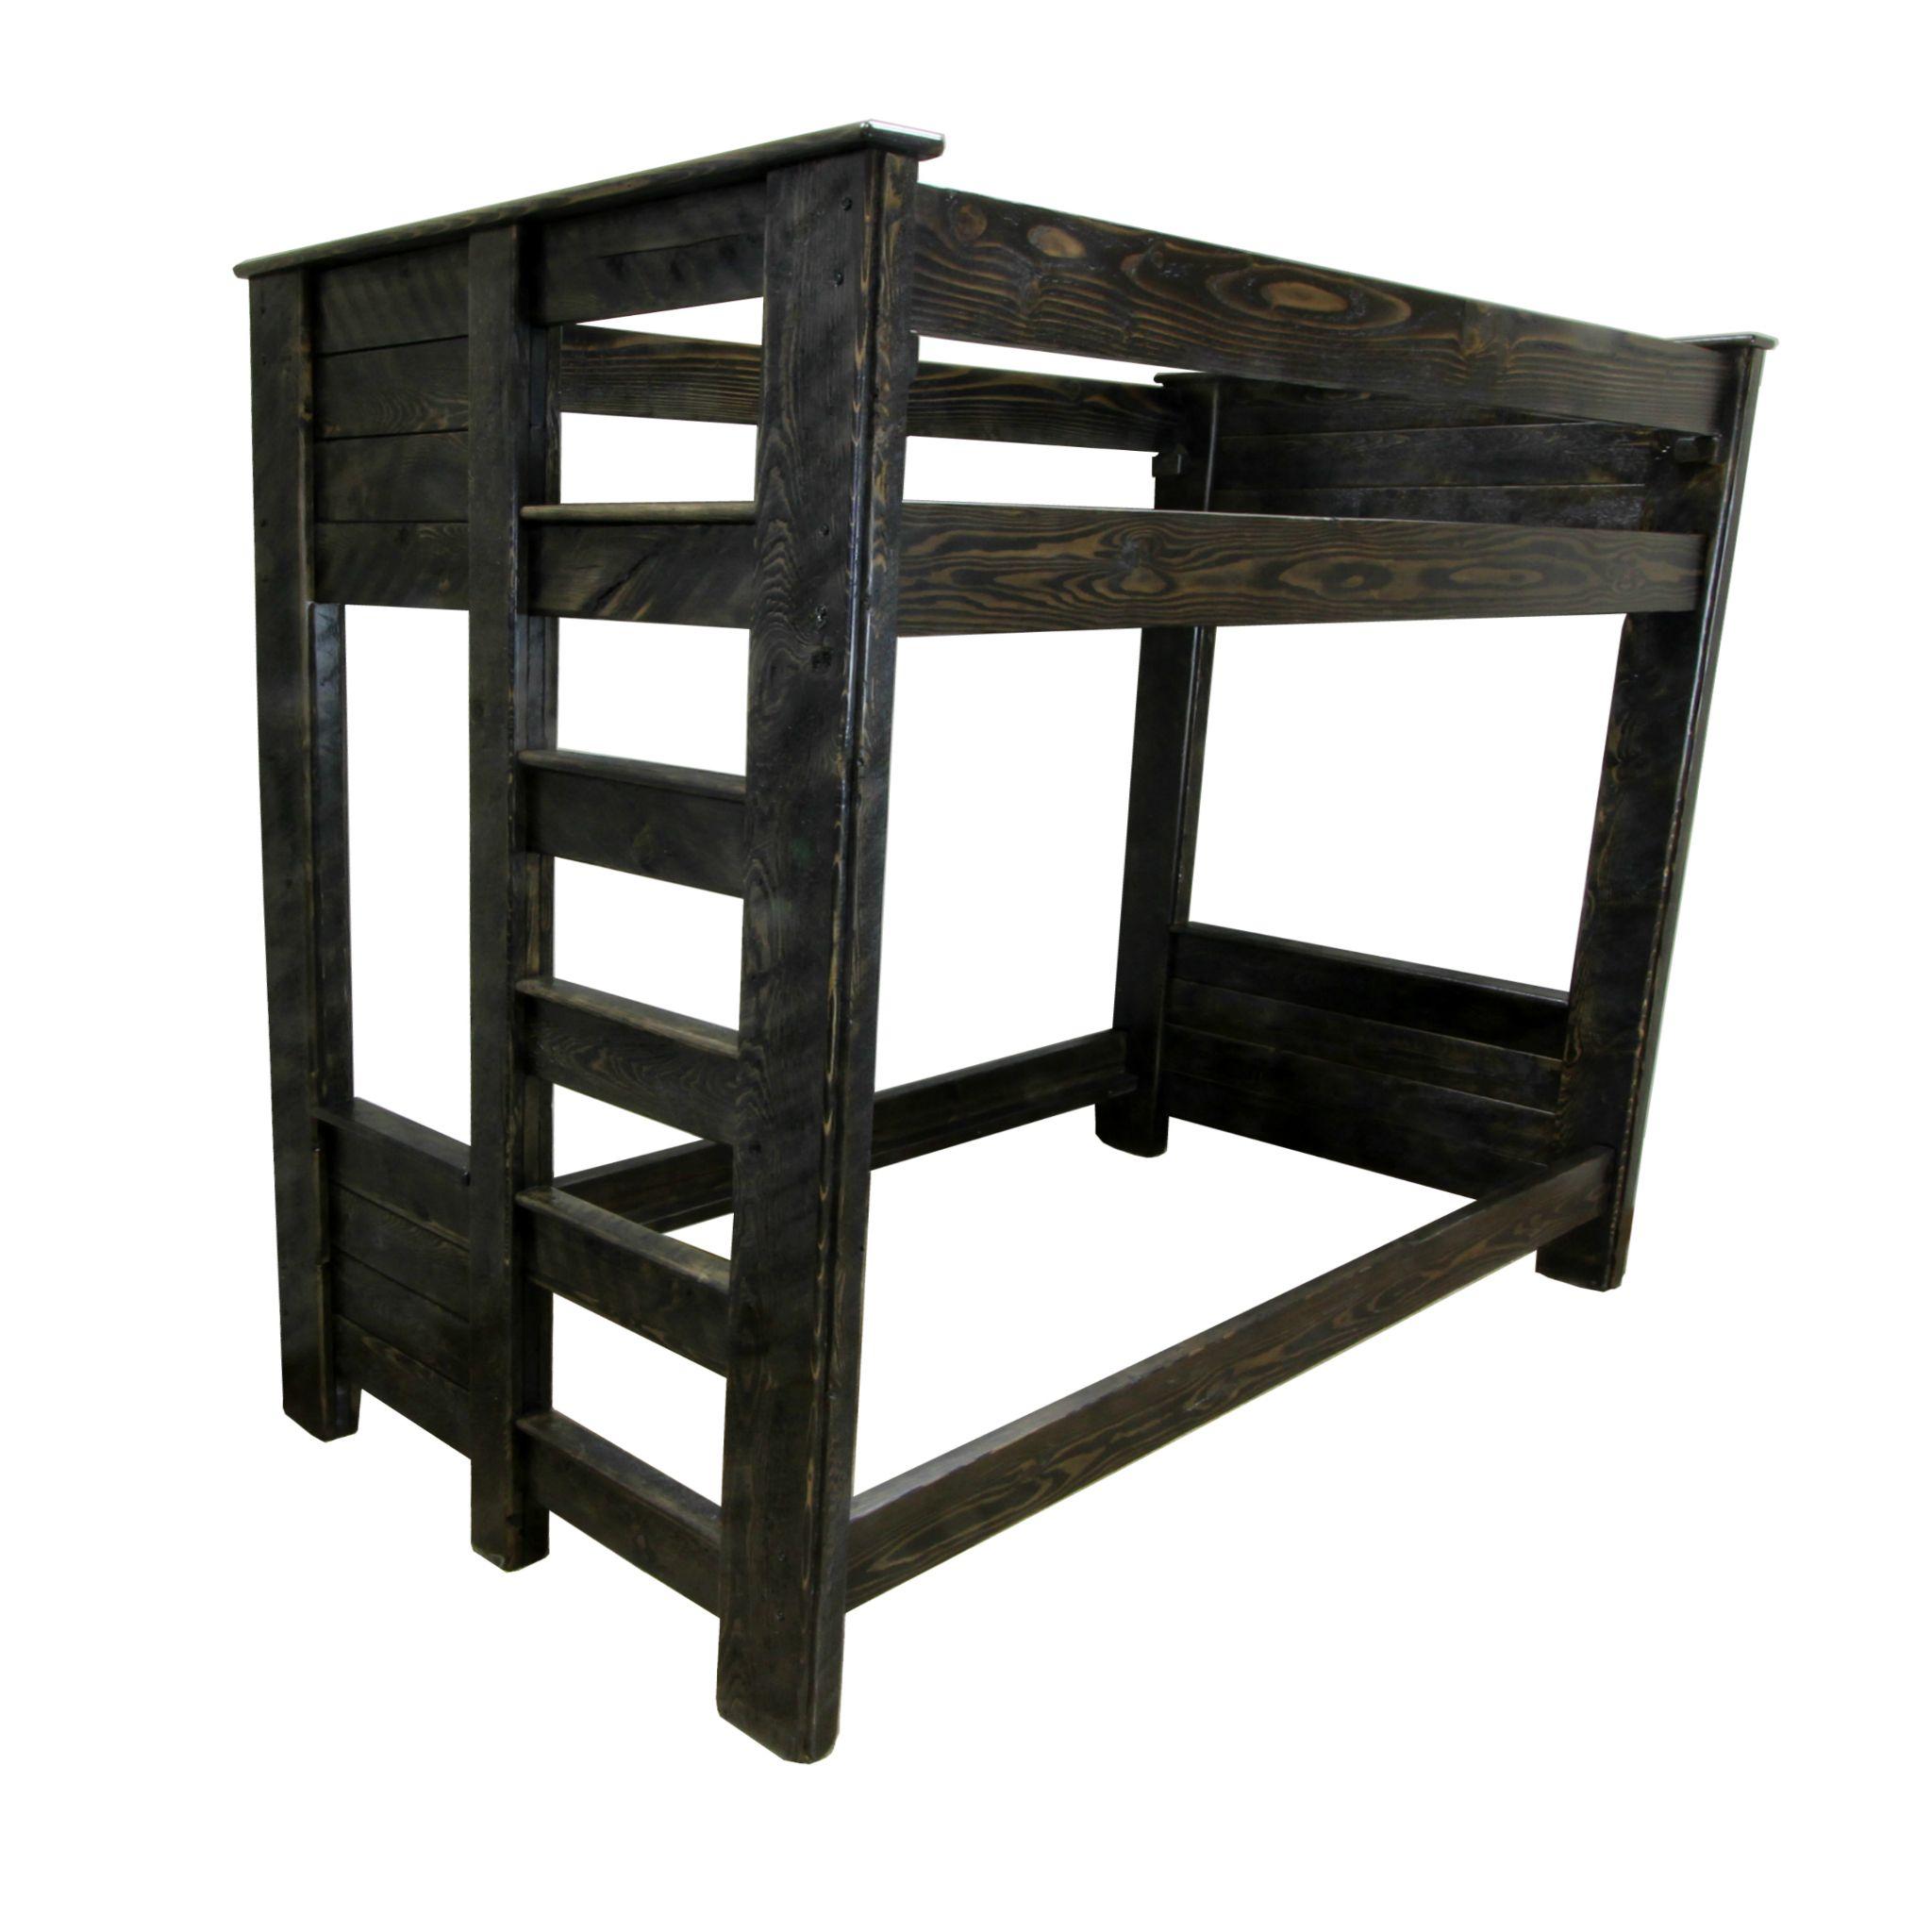 Wood Slat Bunk Bed Wood slats, Bunk beds, Corner furniture